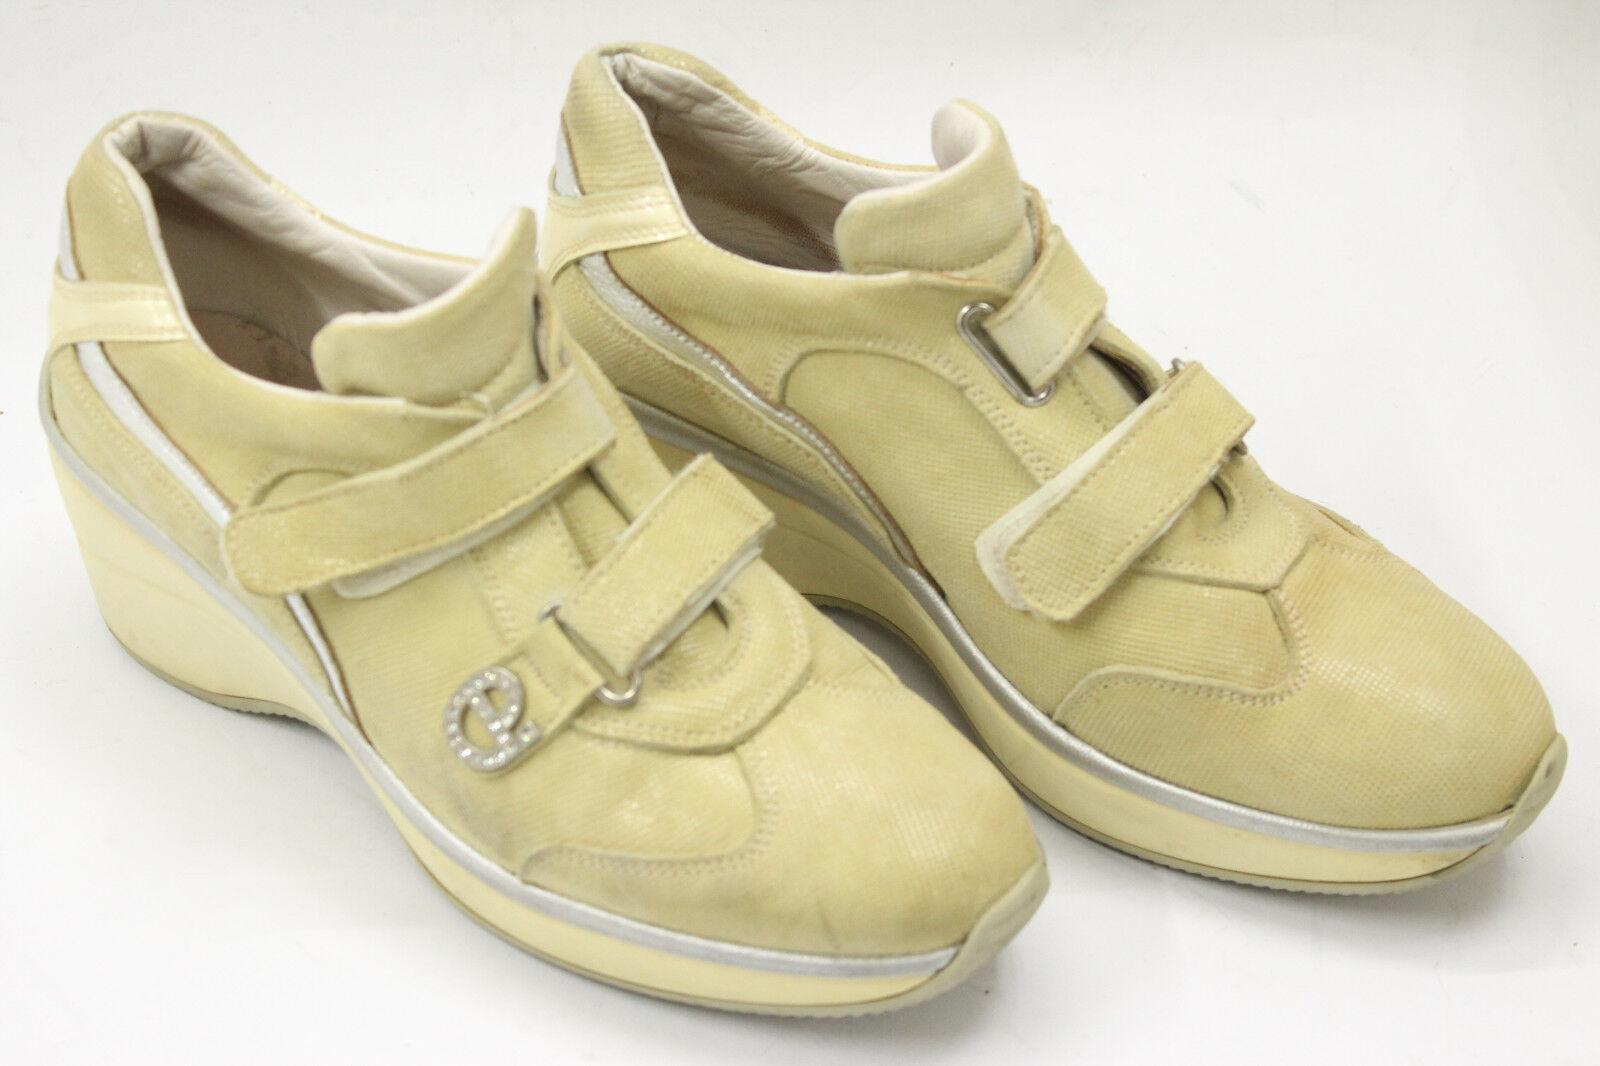 CESARE PACIOTTI Femme  chaussures  sz 7.5 Europe 38 beige  leather S7016